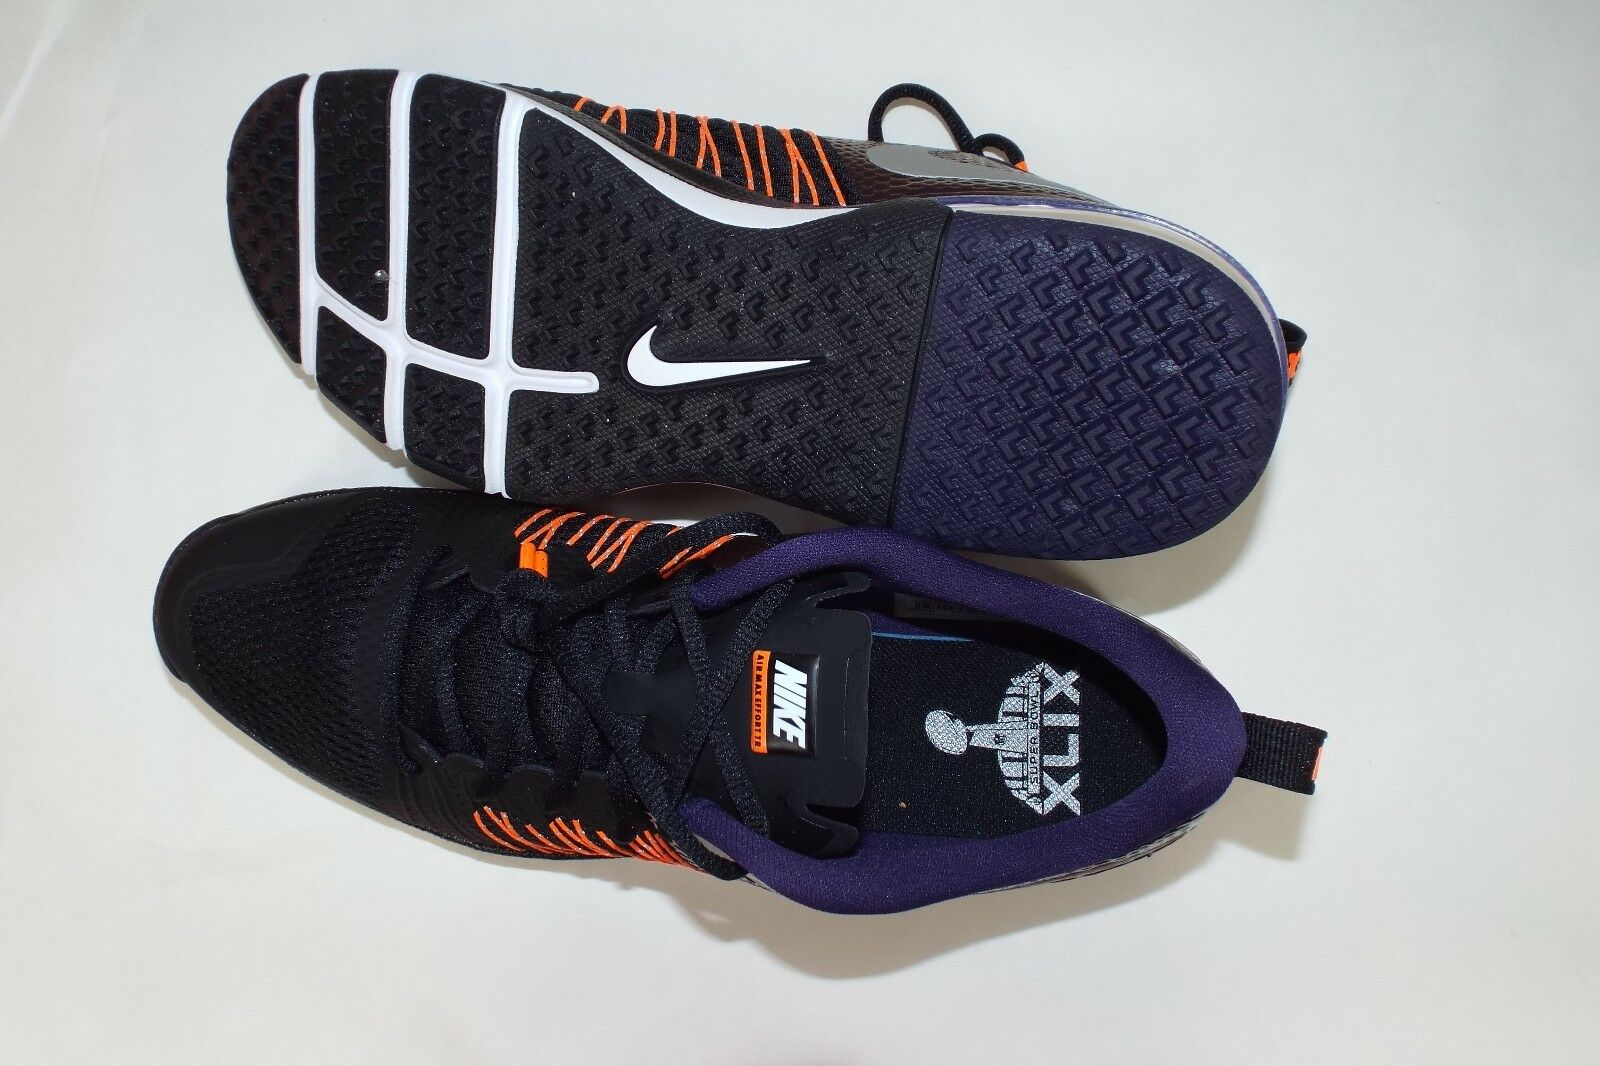 New Hommes 9 NIKE Air Max Effort TR TR Effort AMP Super Bowl XLIX Chaussures  110 705367-008 95a7b3